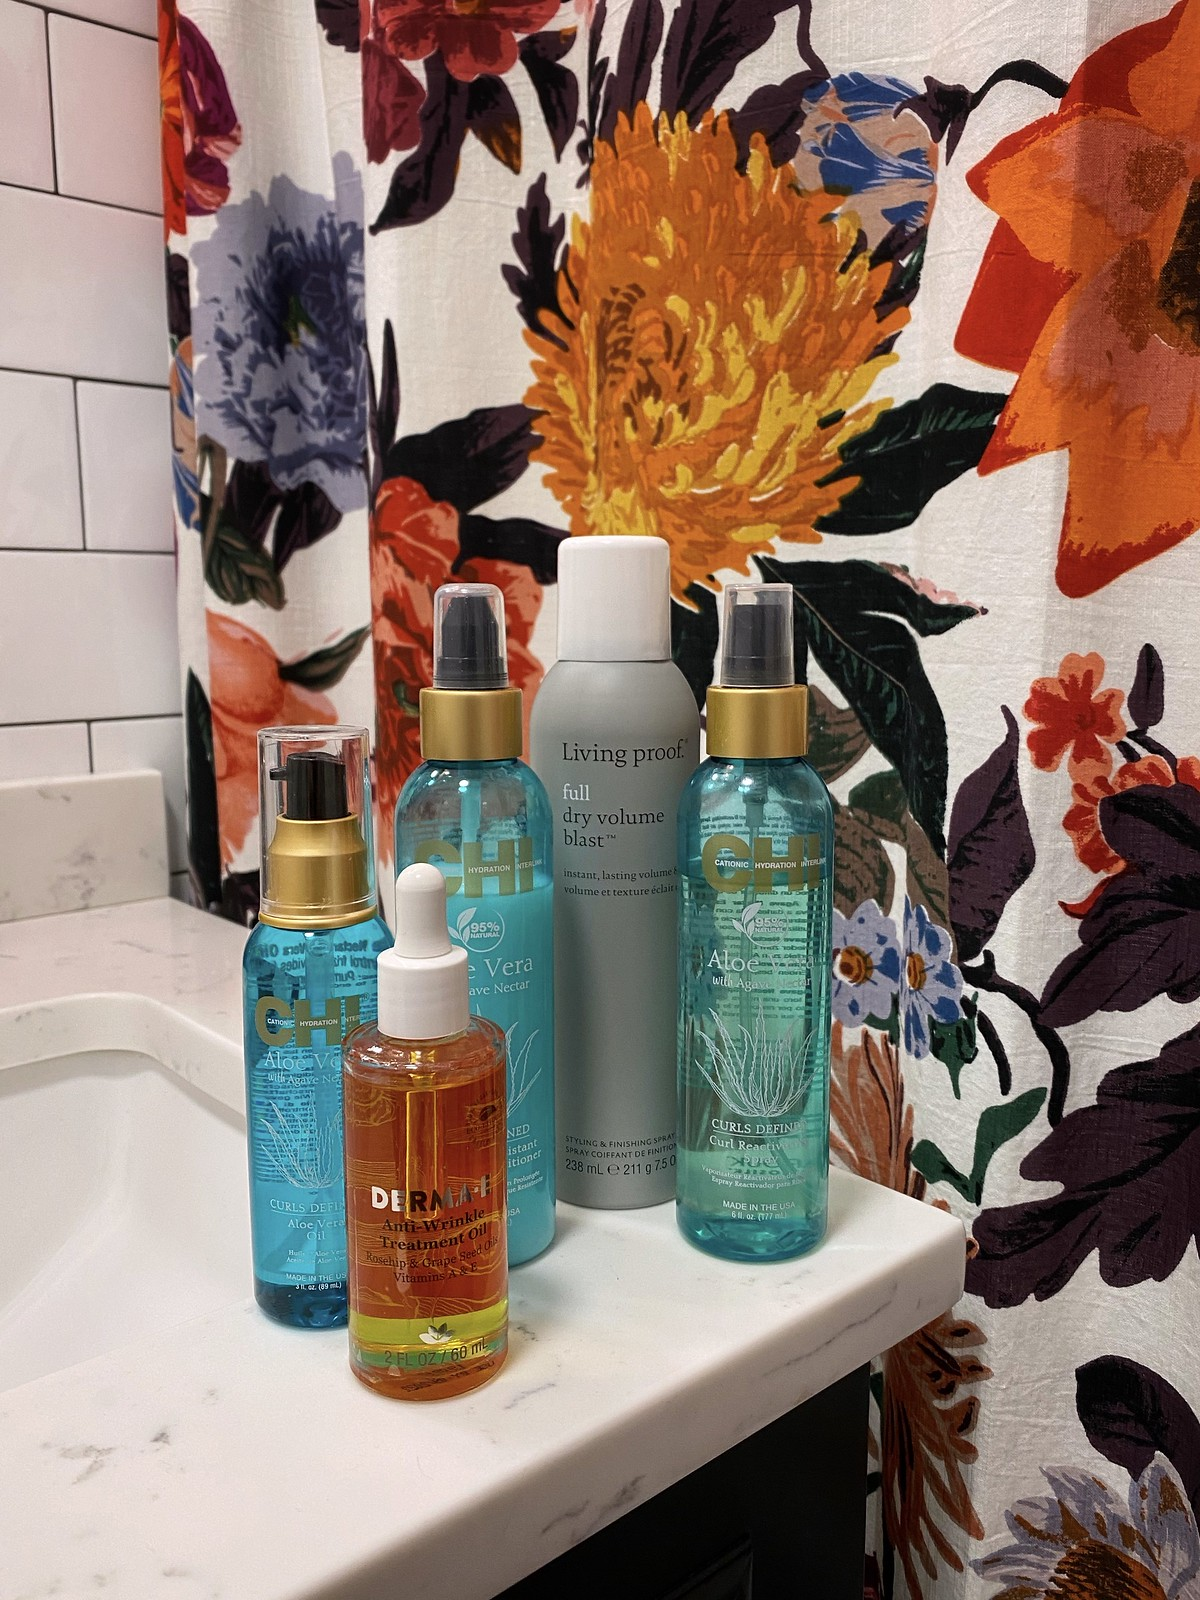 November Beauty Favorites - Chi Aloe Vera Hair Living Proof Full Dry Volume Blast Derma A Anti Wrinkle Oil